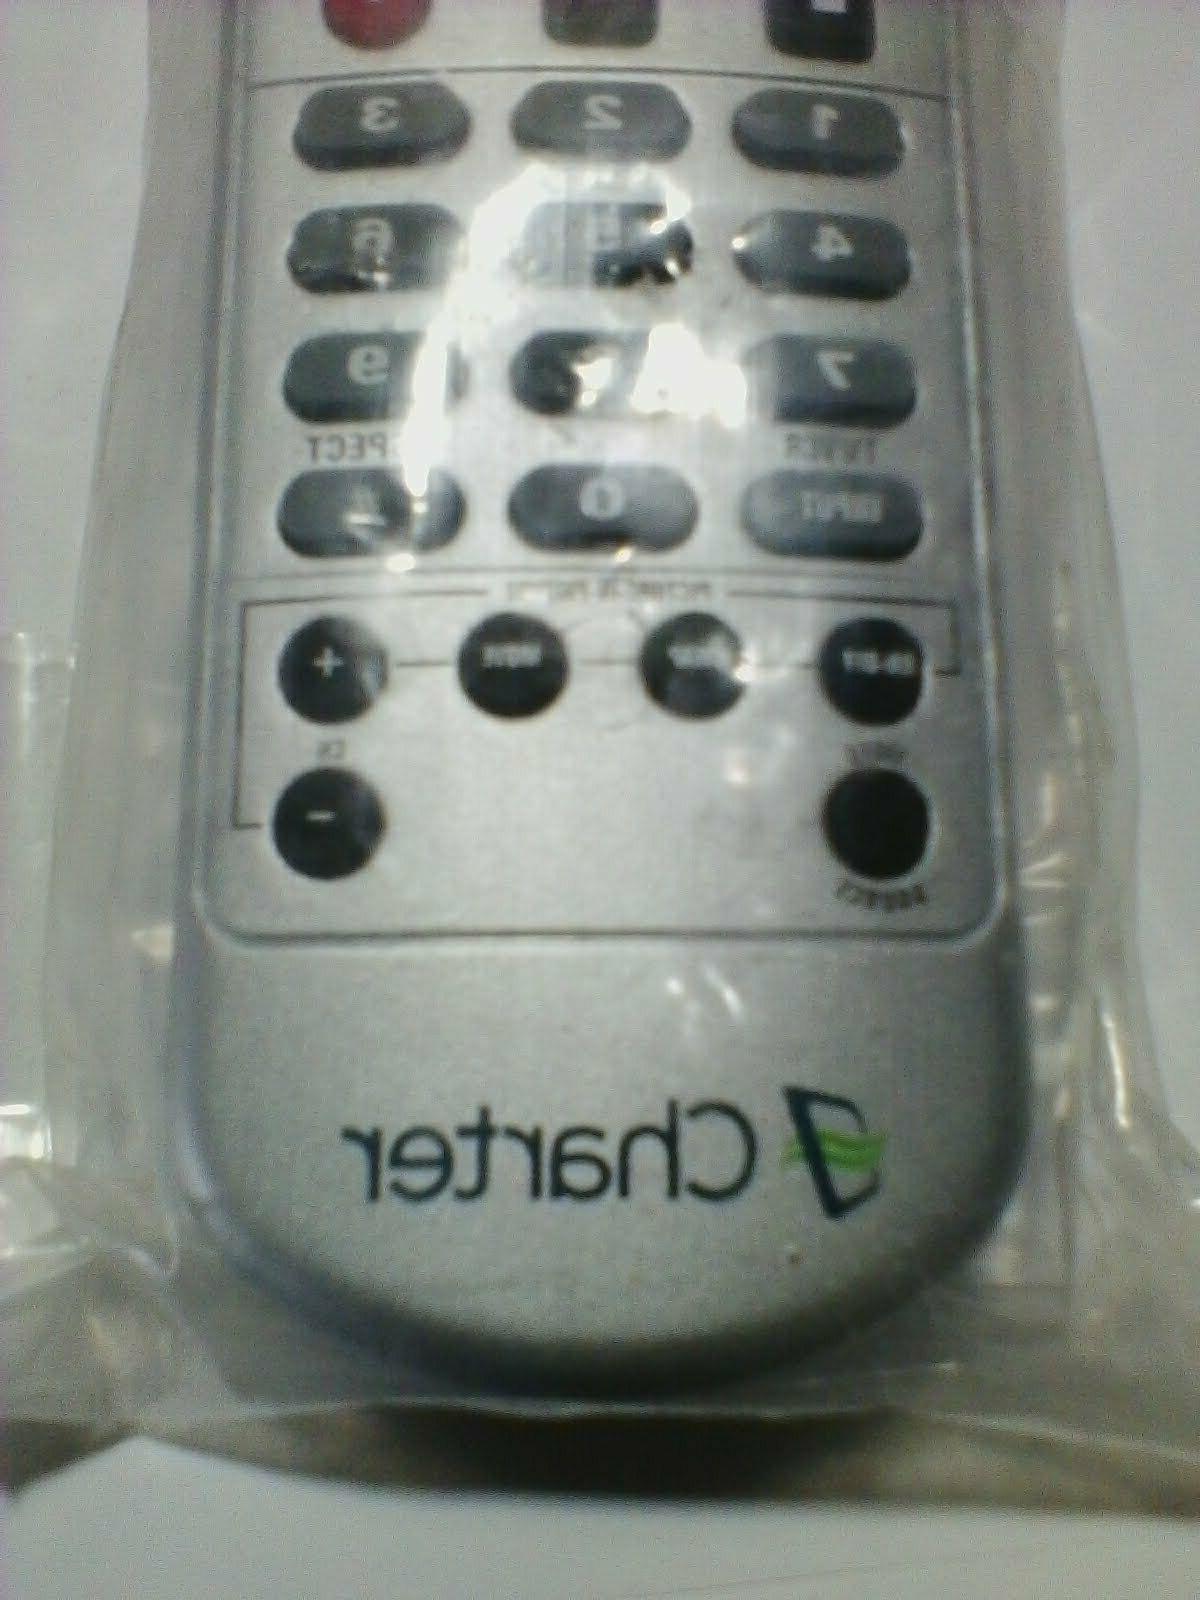 Charter 4 Device Universal Remote Control DVD DVR